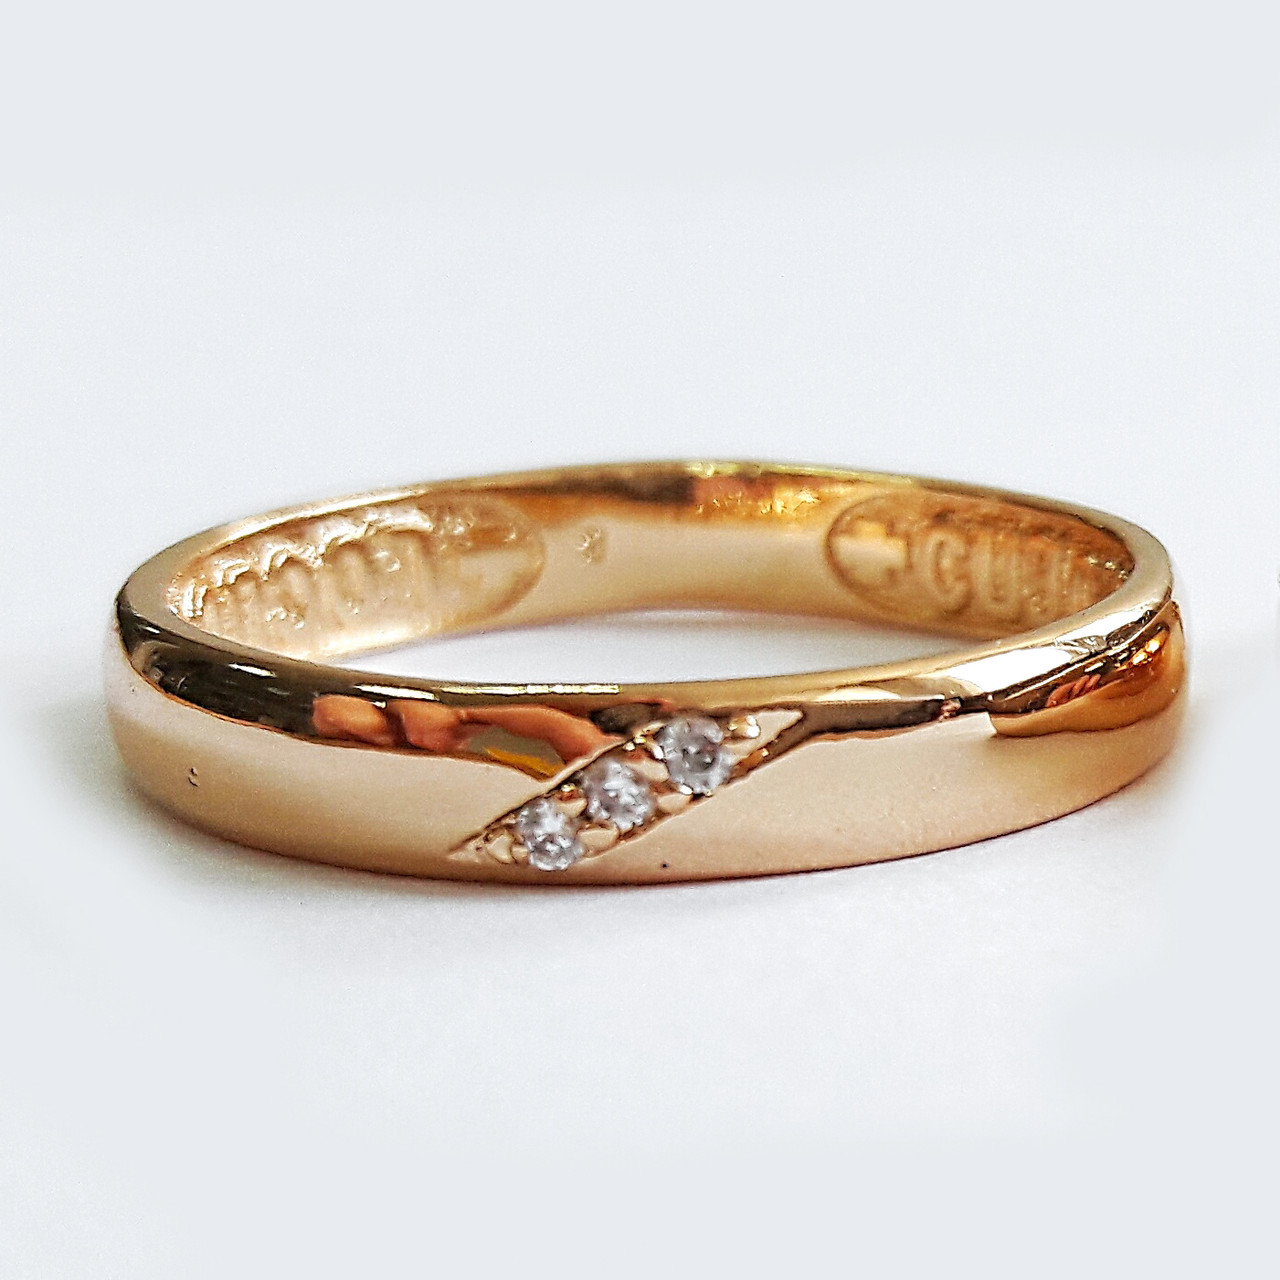 Кольцо 3мм xuping 17р. мед золото спаси и сохрани 148391